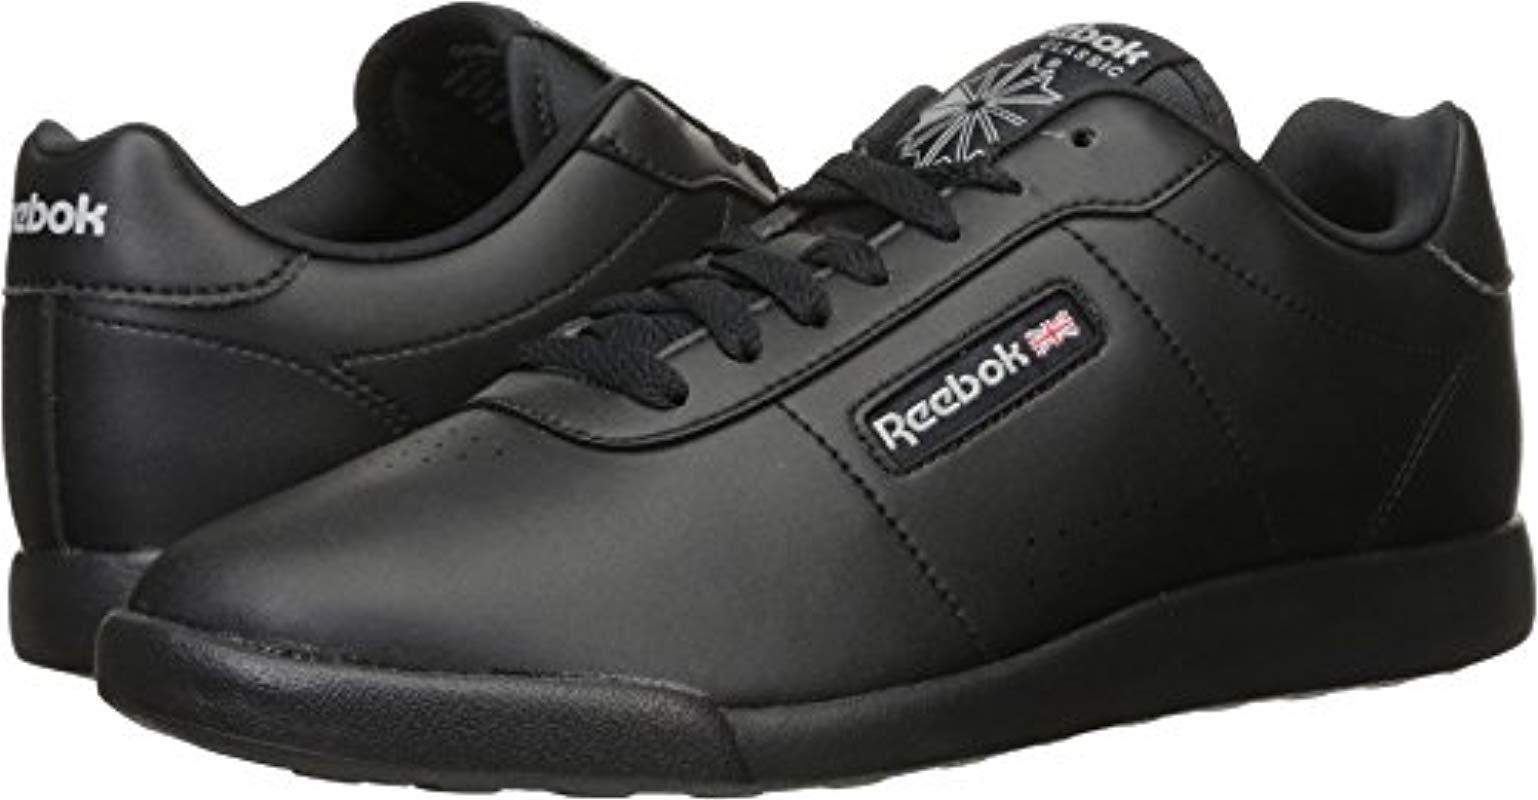 475f7a0dbcdf Reebok - Black Princess Lite Classic Shoe - Lyst. View fullscreen